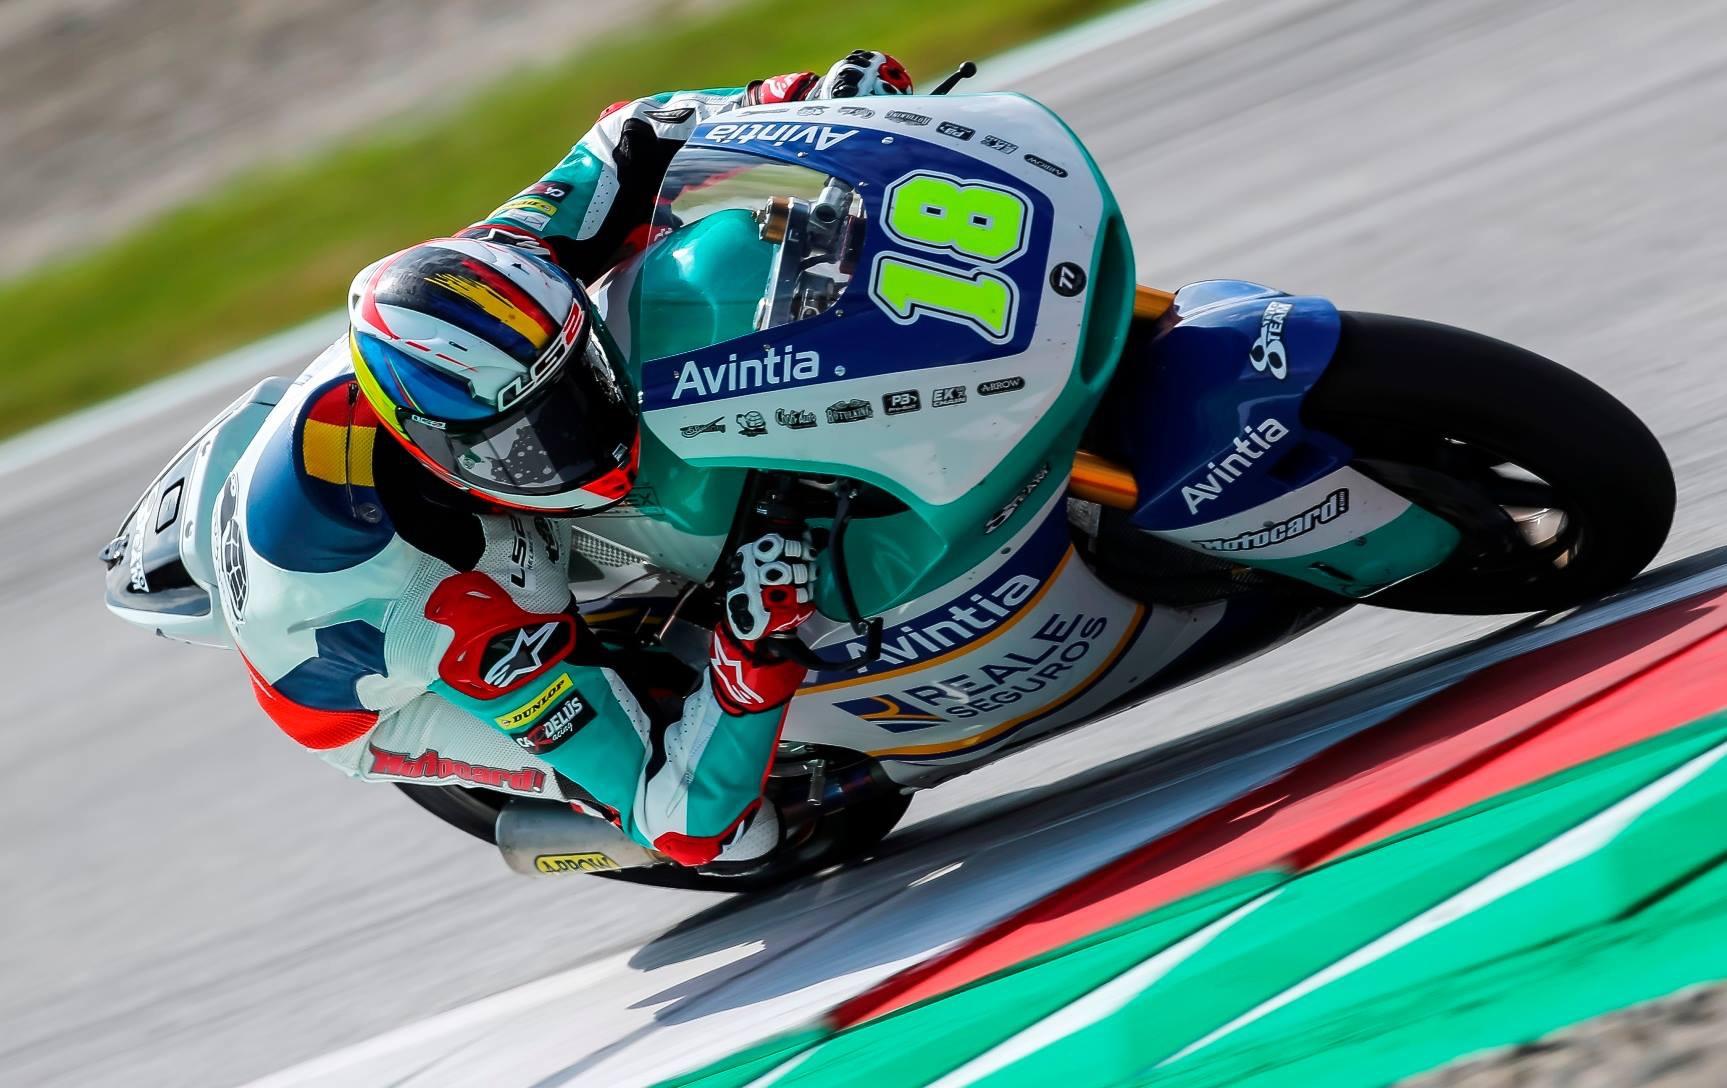 Campeonato del mundo de Moto2 2018